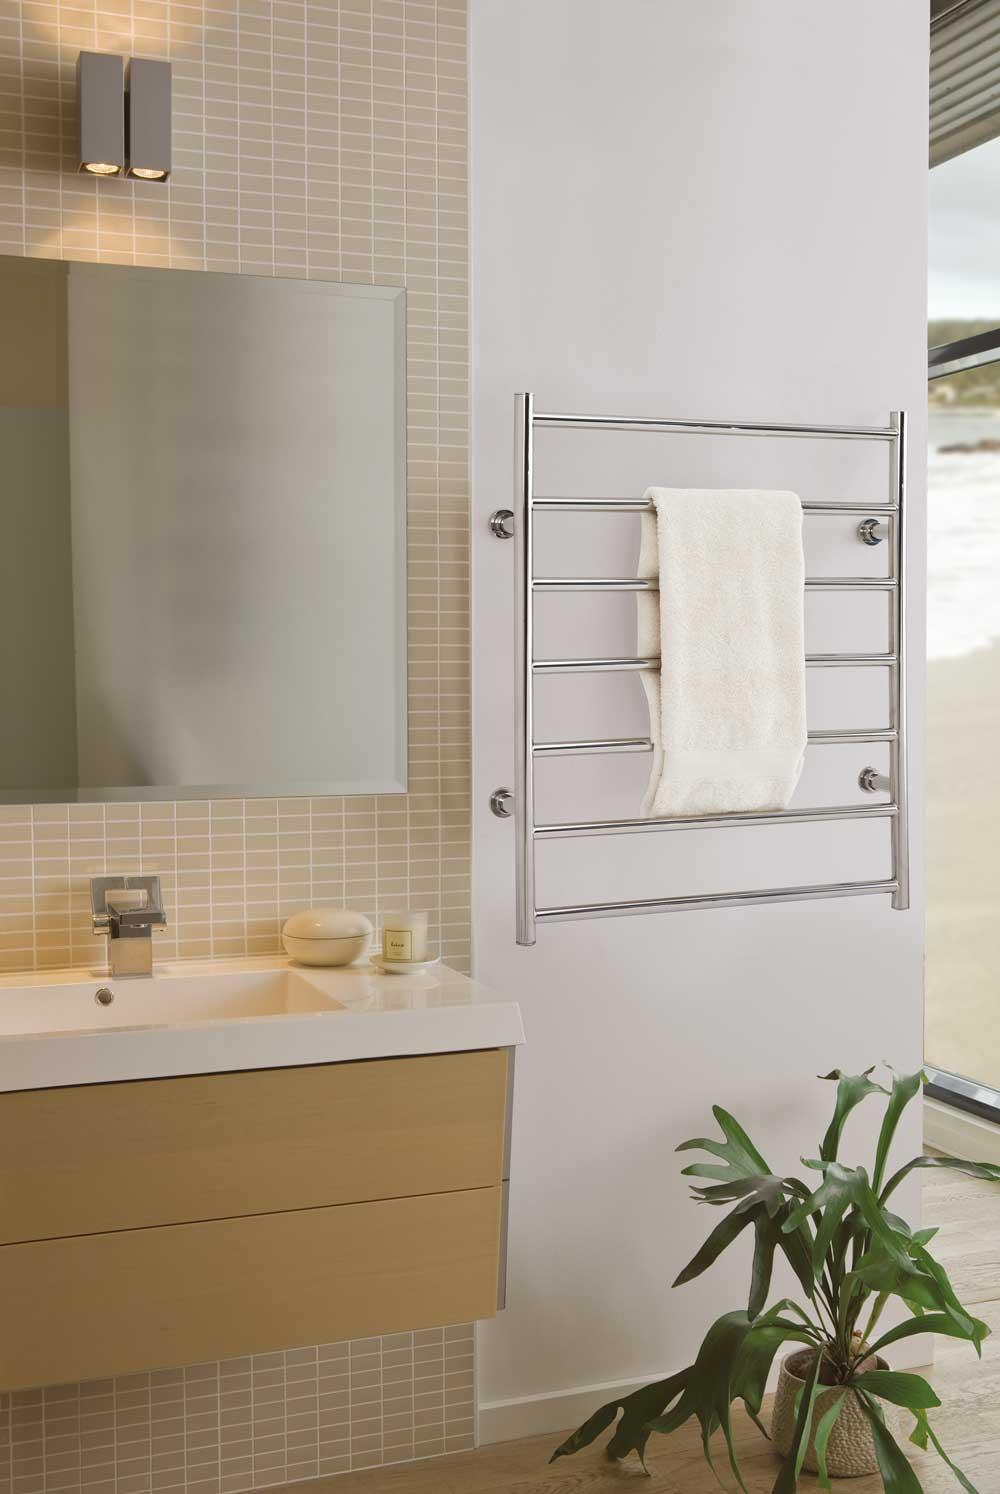 Håndklædetørrer